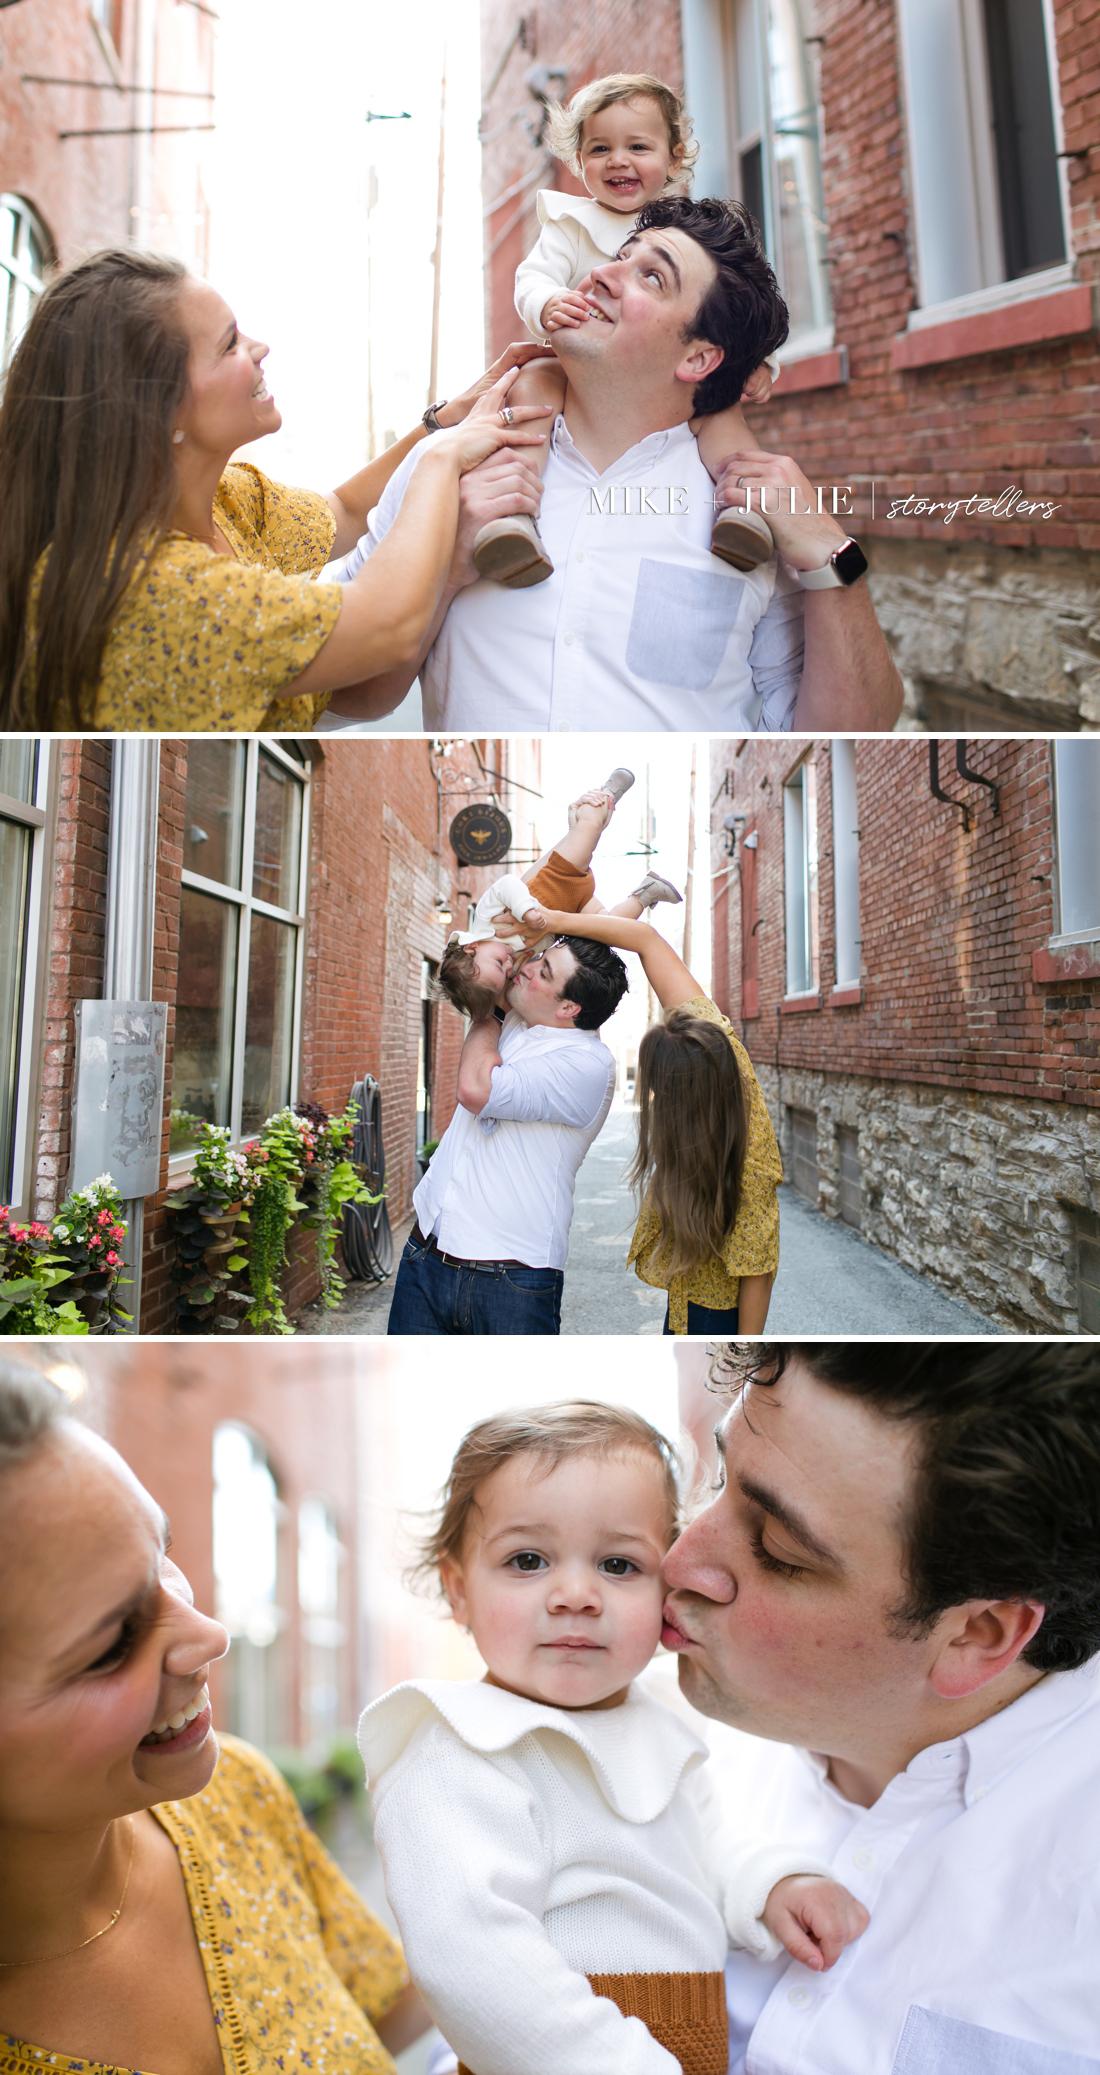 family photos can be fun Overland Park photographers